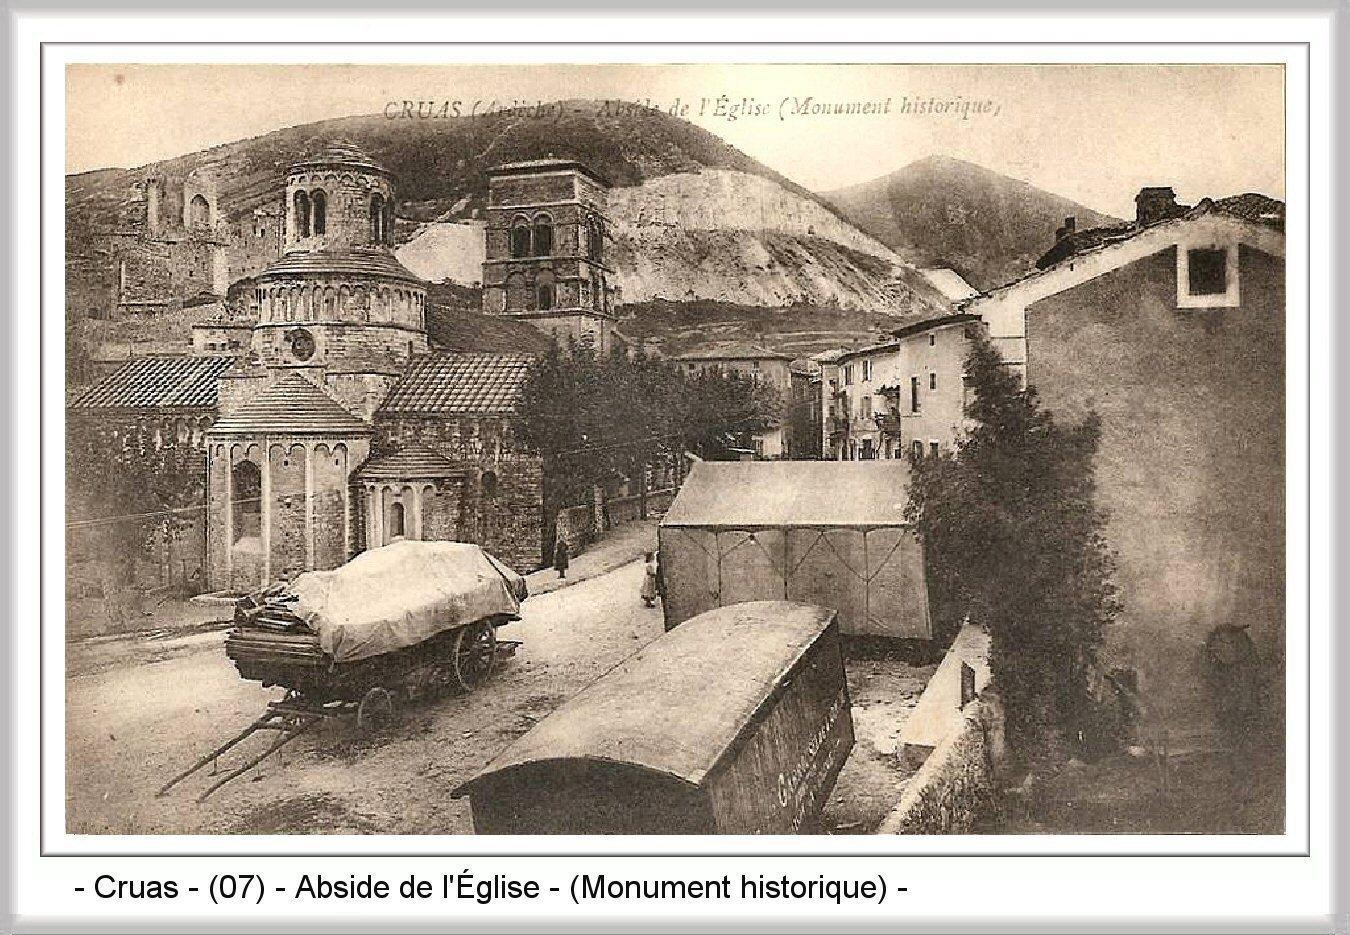 https://en.geneanet.org/public/img/gallery/pictures/cartes_postales/a6/5998192/large.jpg